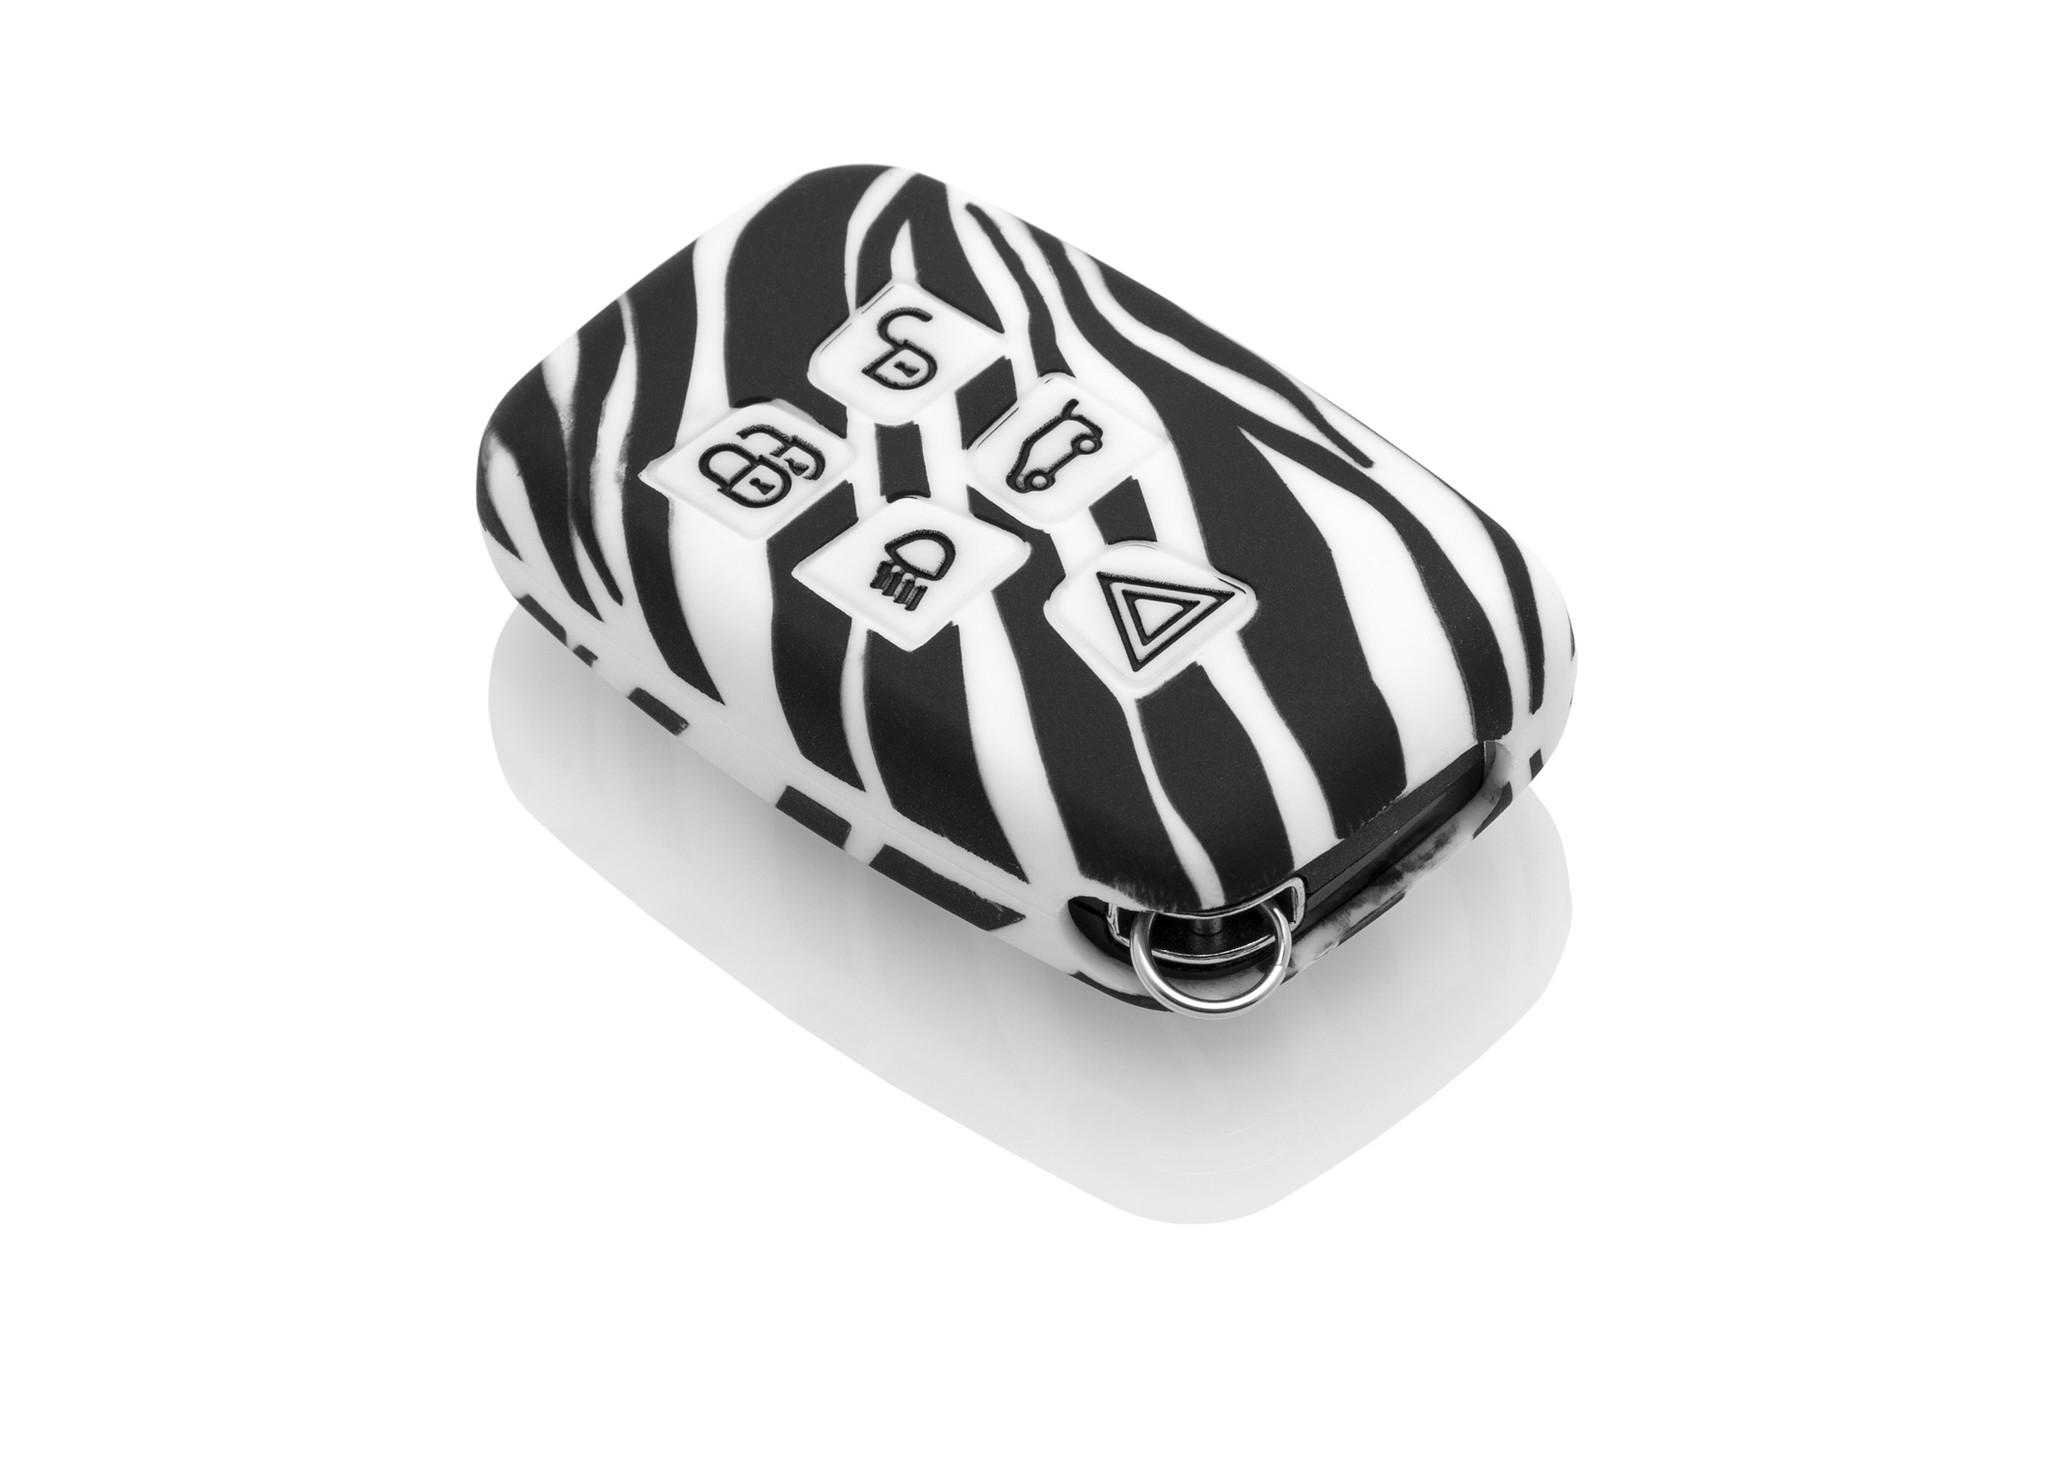 TBU car TBU car Sleutel cover compatibel met Range Rover - Silicone sleutelhoesje - beschermhoesje autosleutel - Zebra